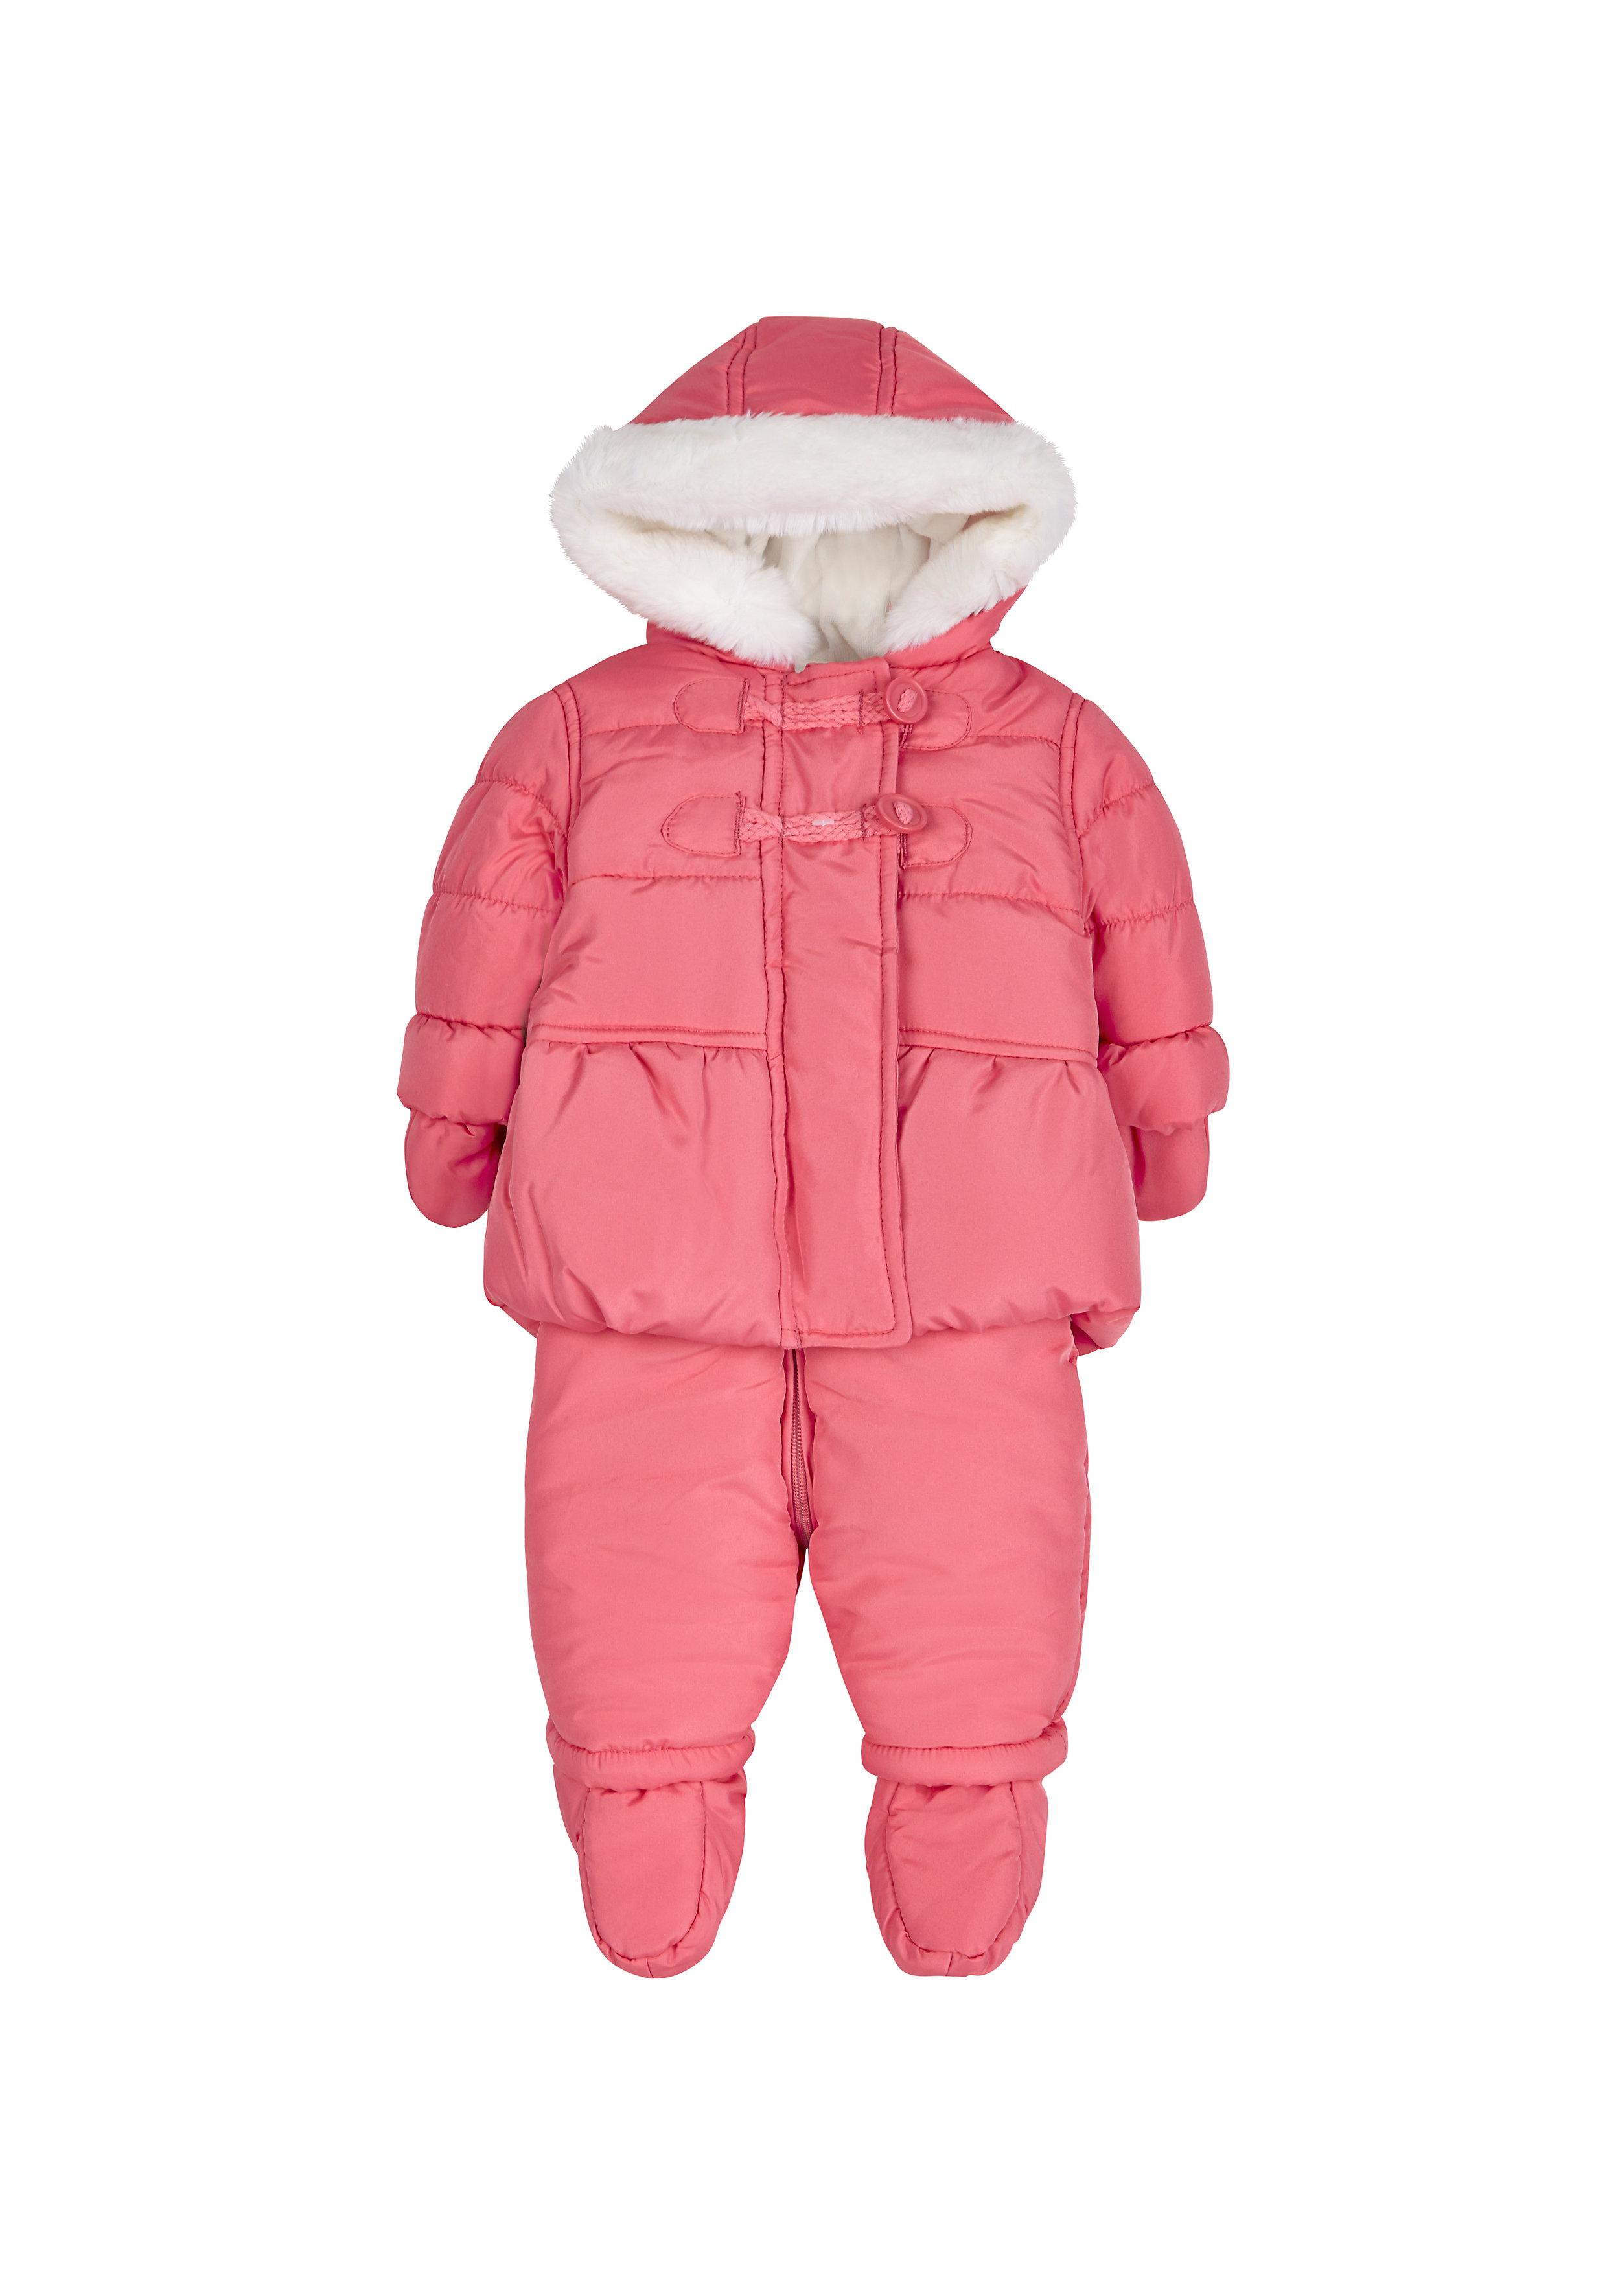 Mothercare | Girls Jacket And Legging Set  - Pink